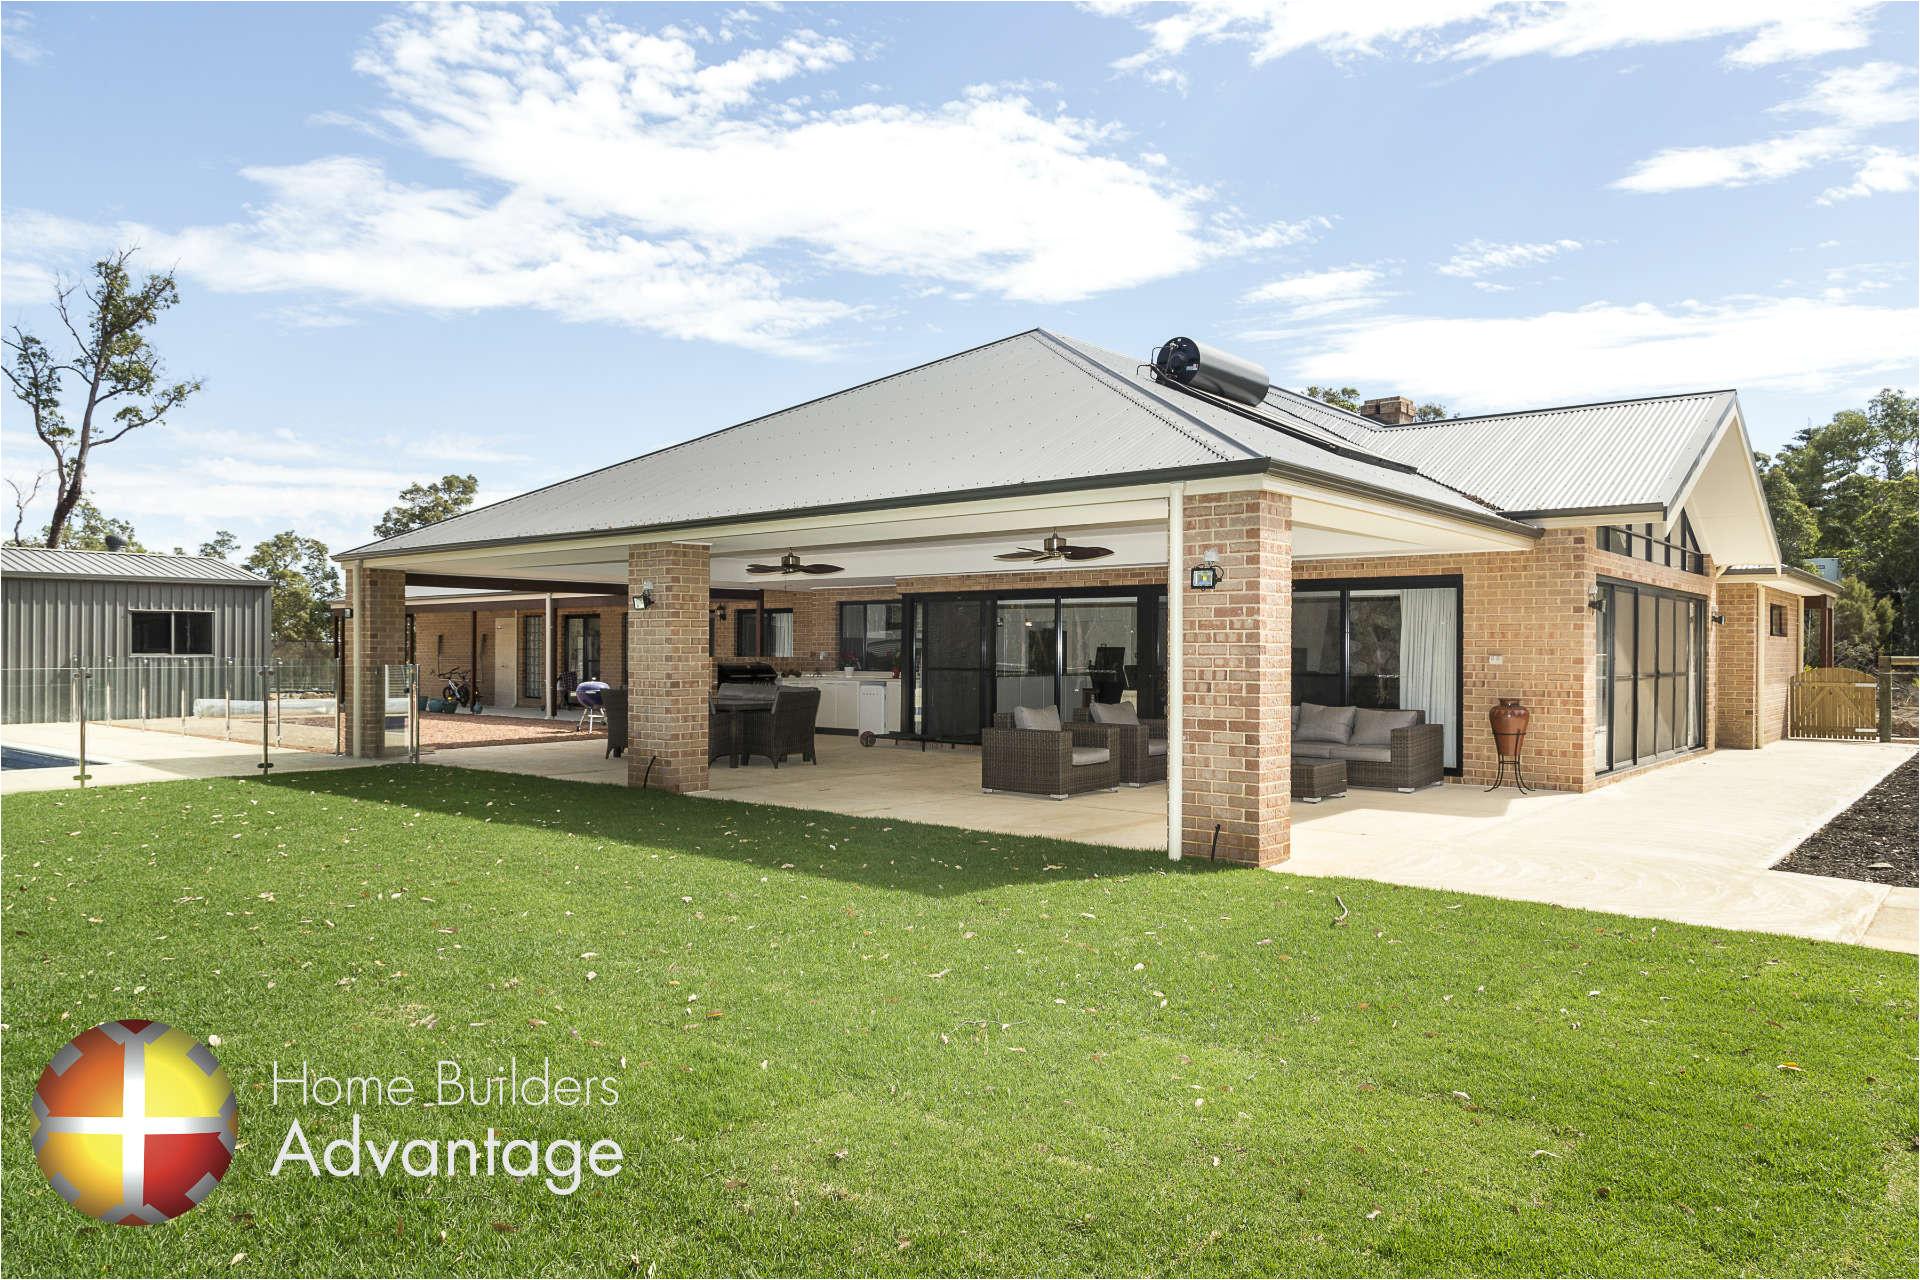 inspiring rural home designs 19 photo